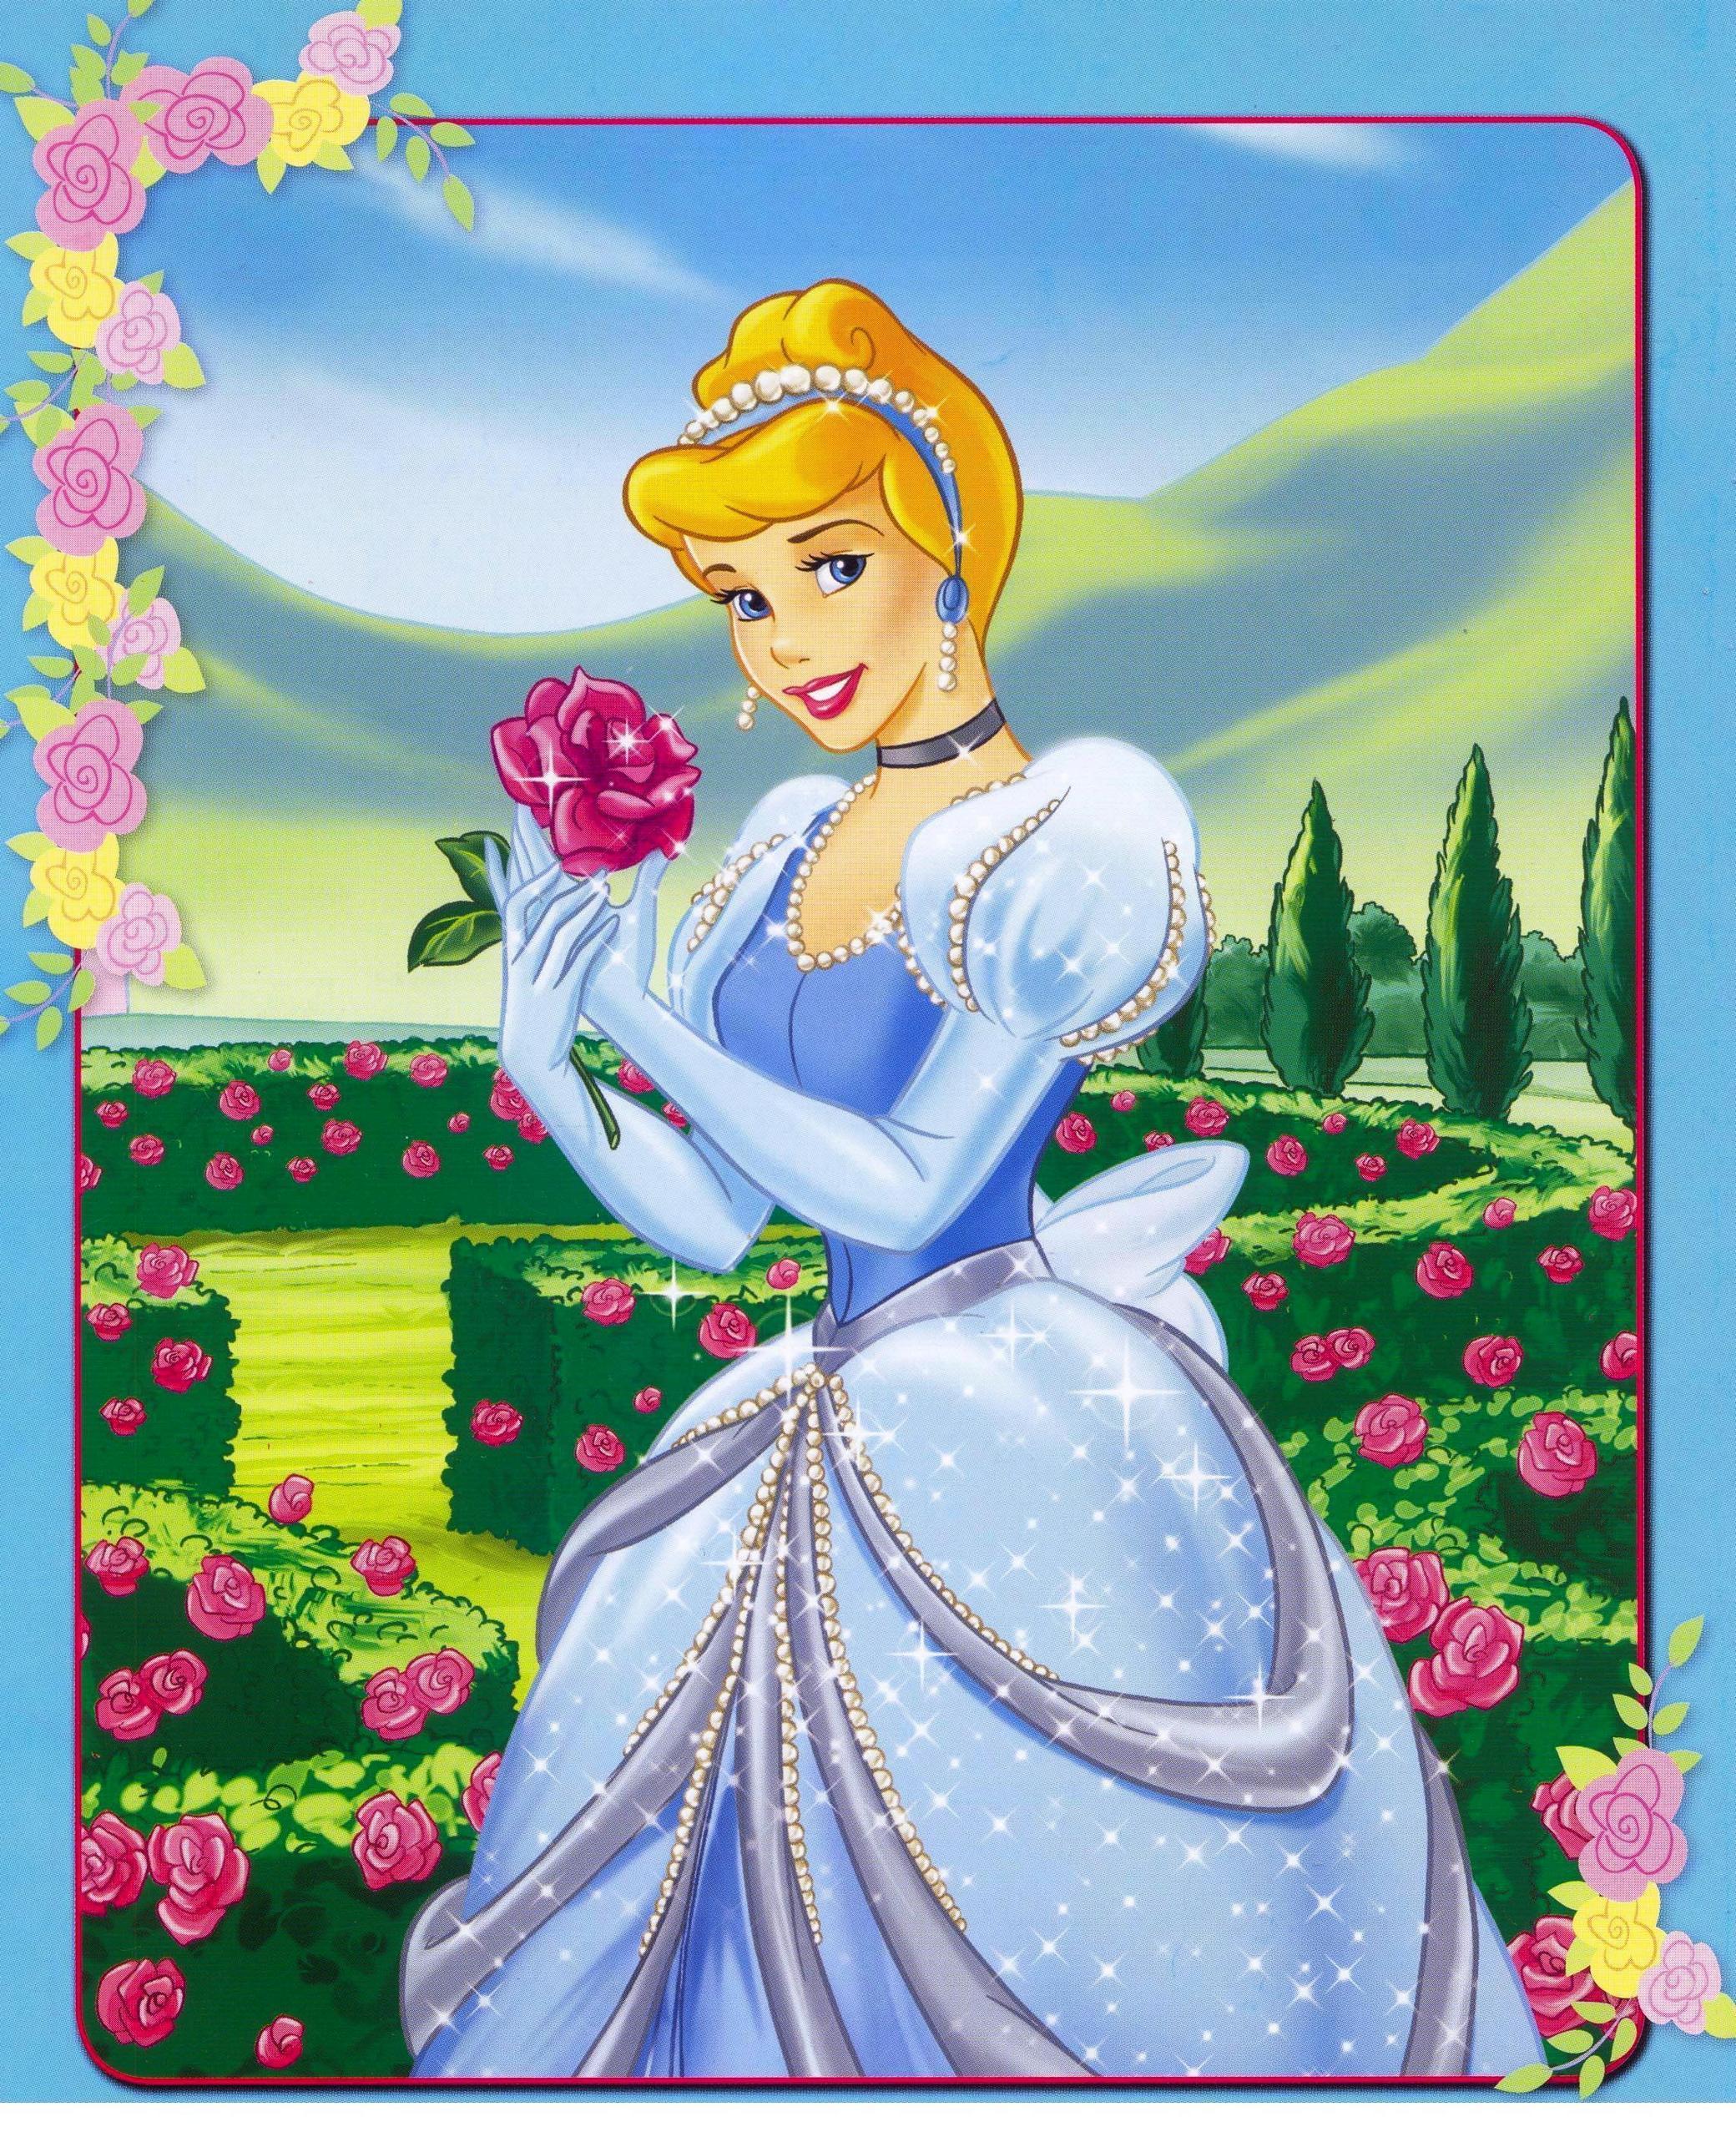 Cinderella Disney Princess Wallpaper HD Iphone 2080x2560